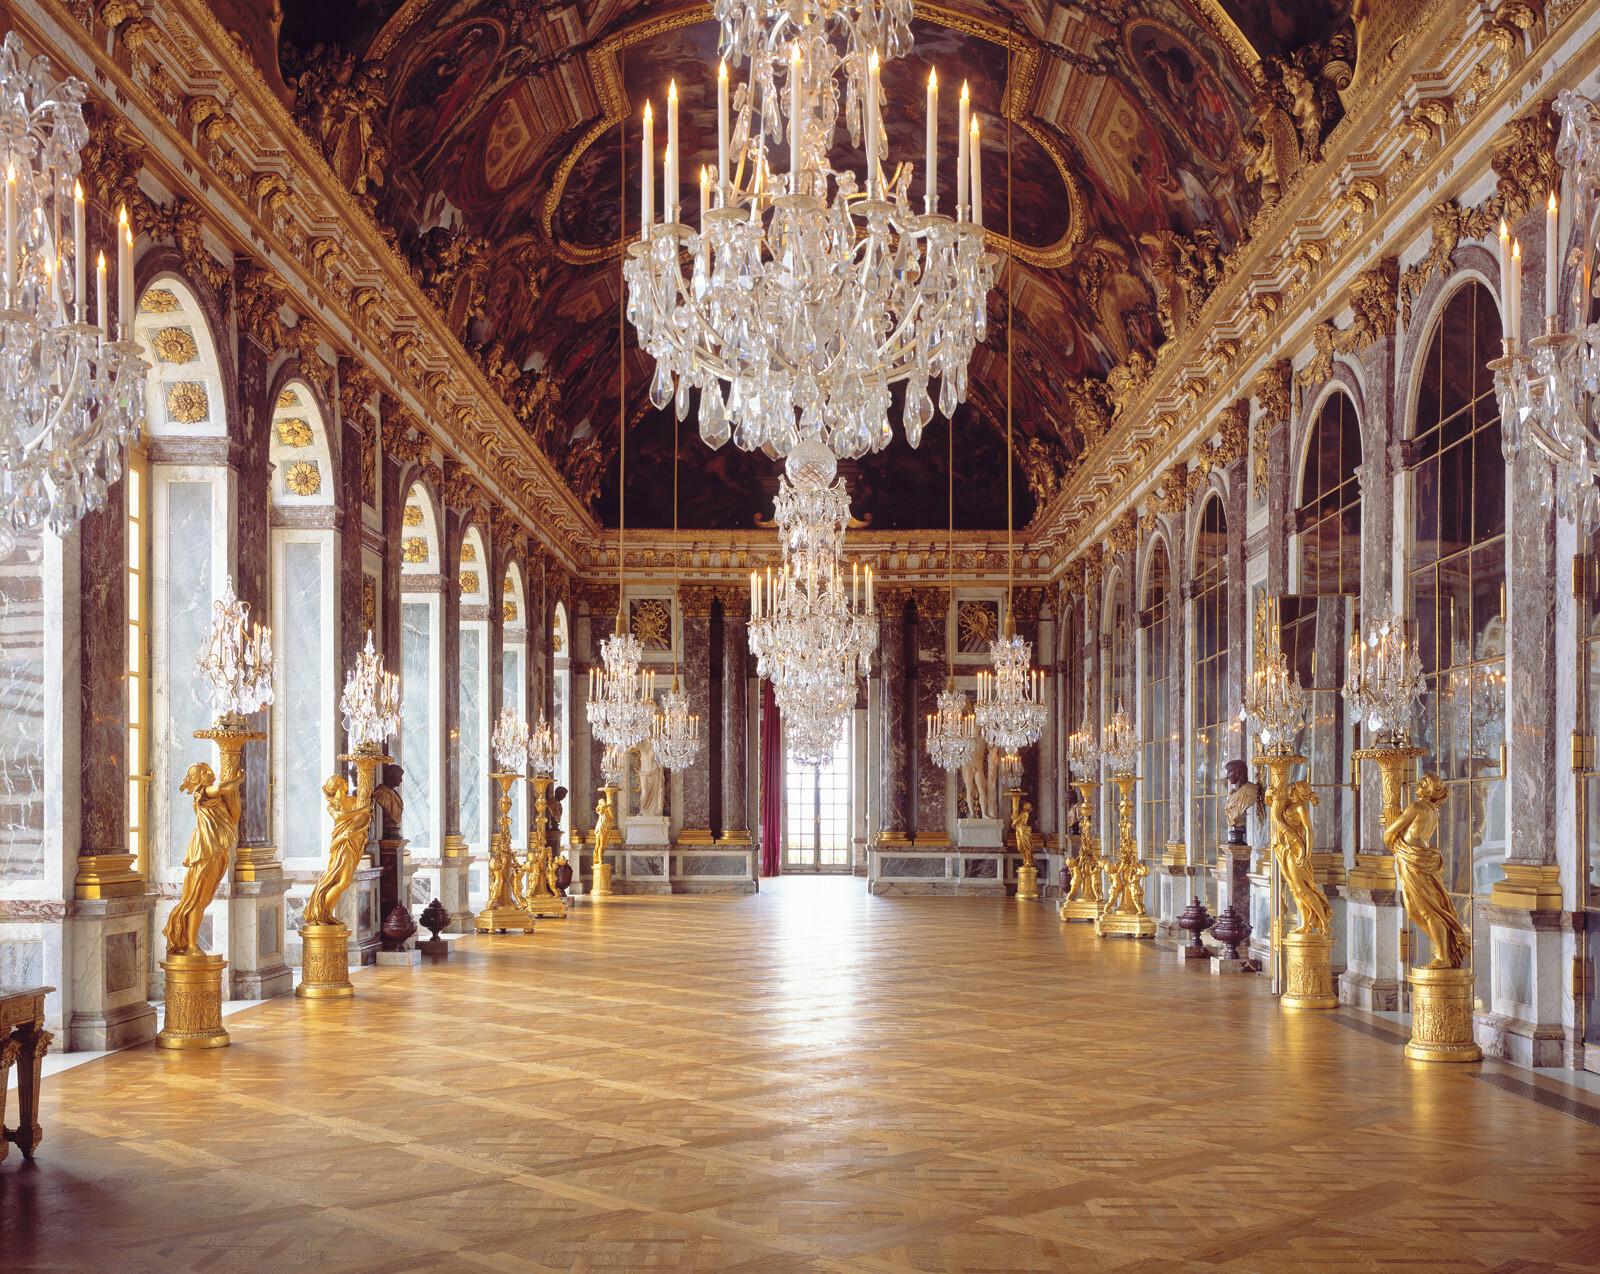 Château de Versailles, Galerie des Glaces - Reinhard Görner